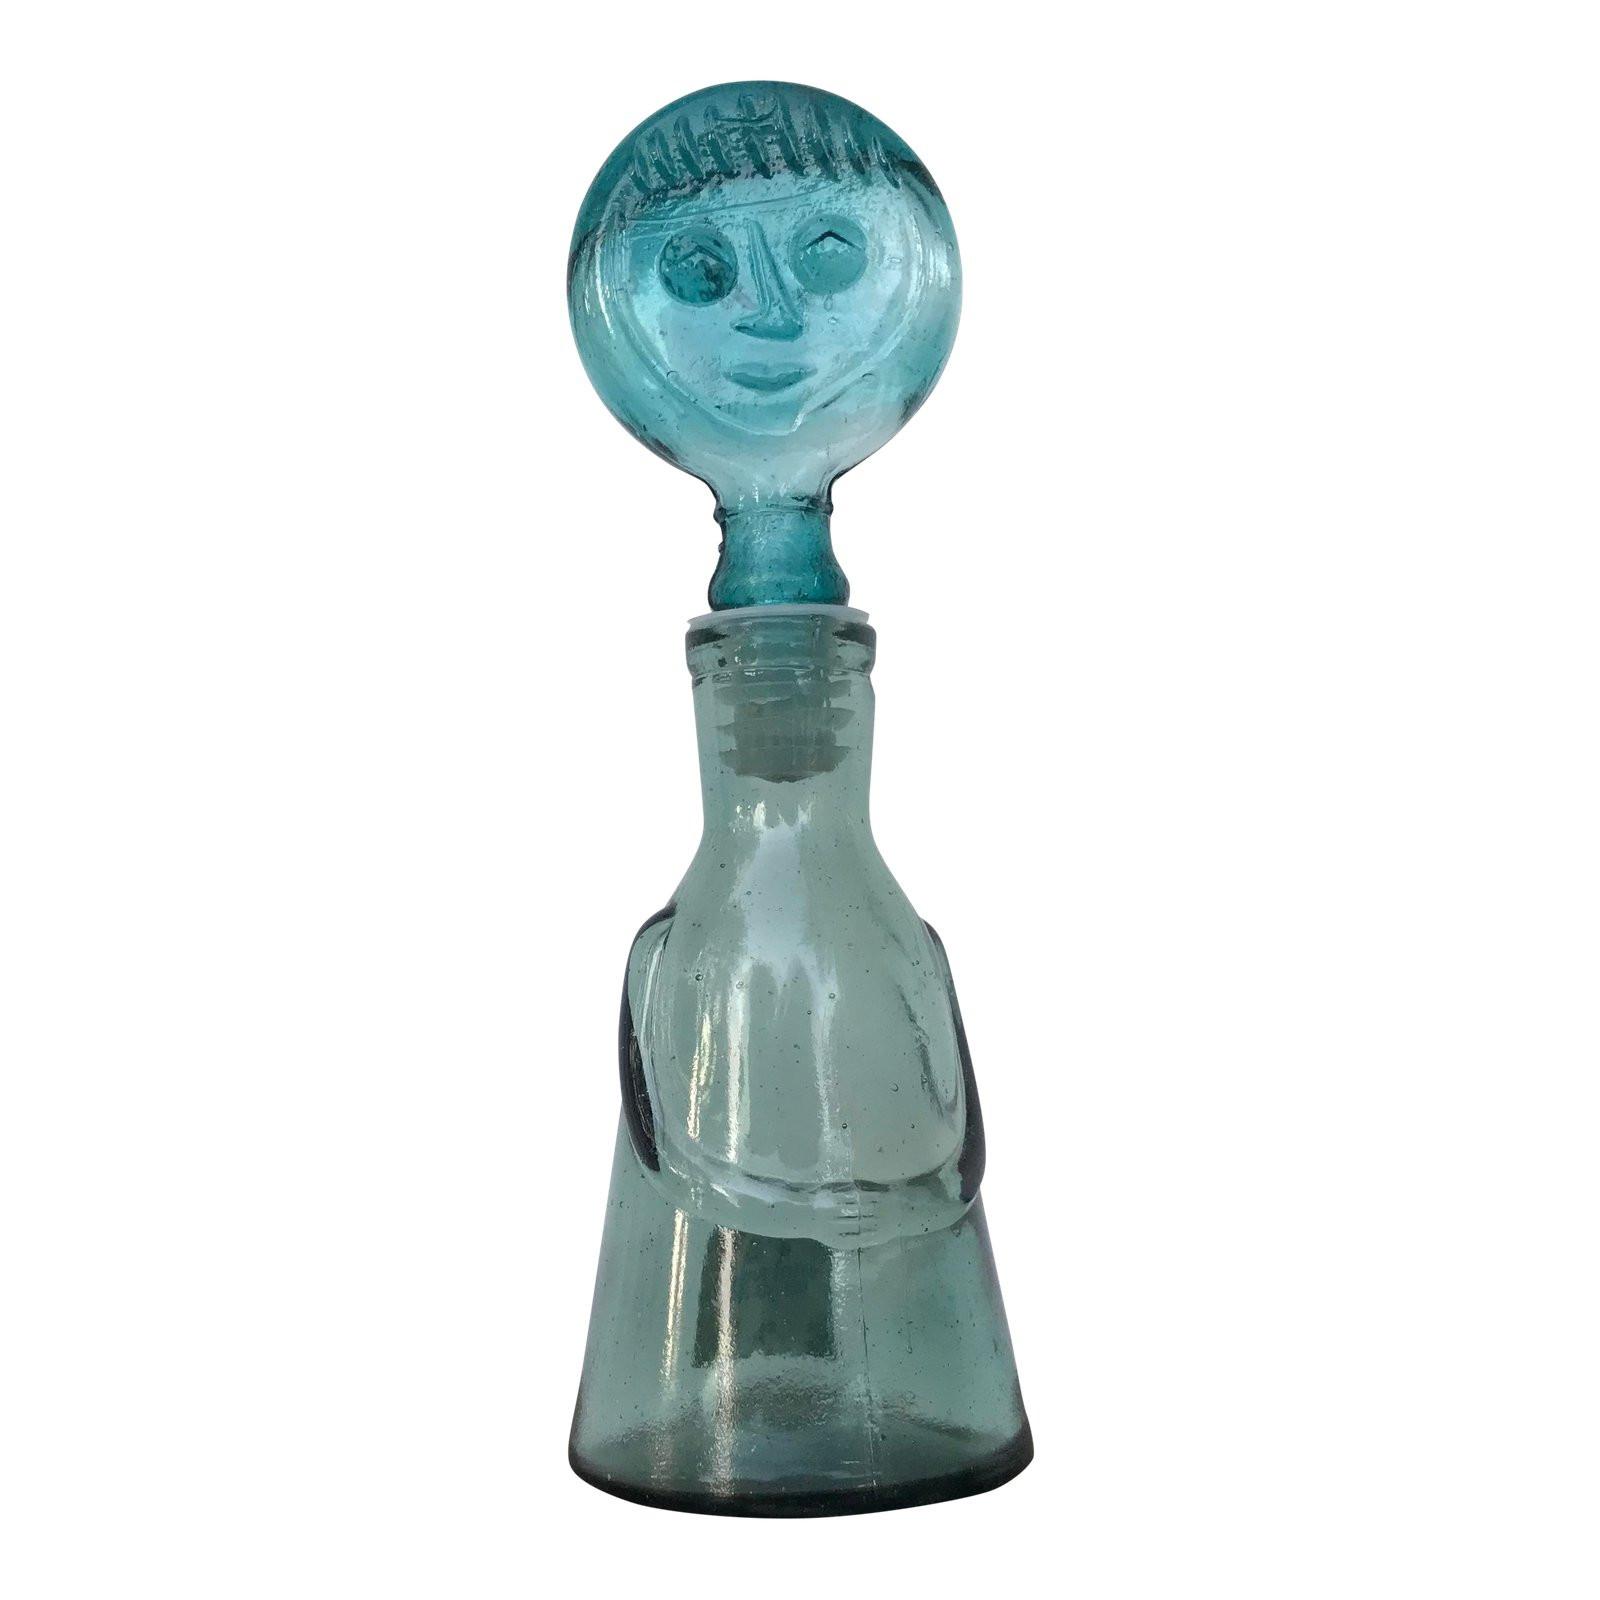 kosta boda face vase of 1960s vintage erik hoglund for kosta boda blue glass person bottle throughout 1960s vintage erik hoglund for kosta boda blue glass person bottle chairish